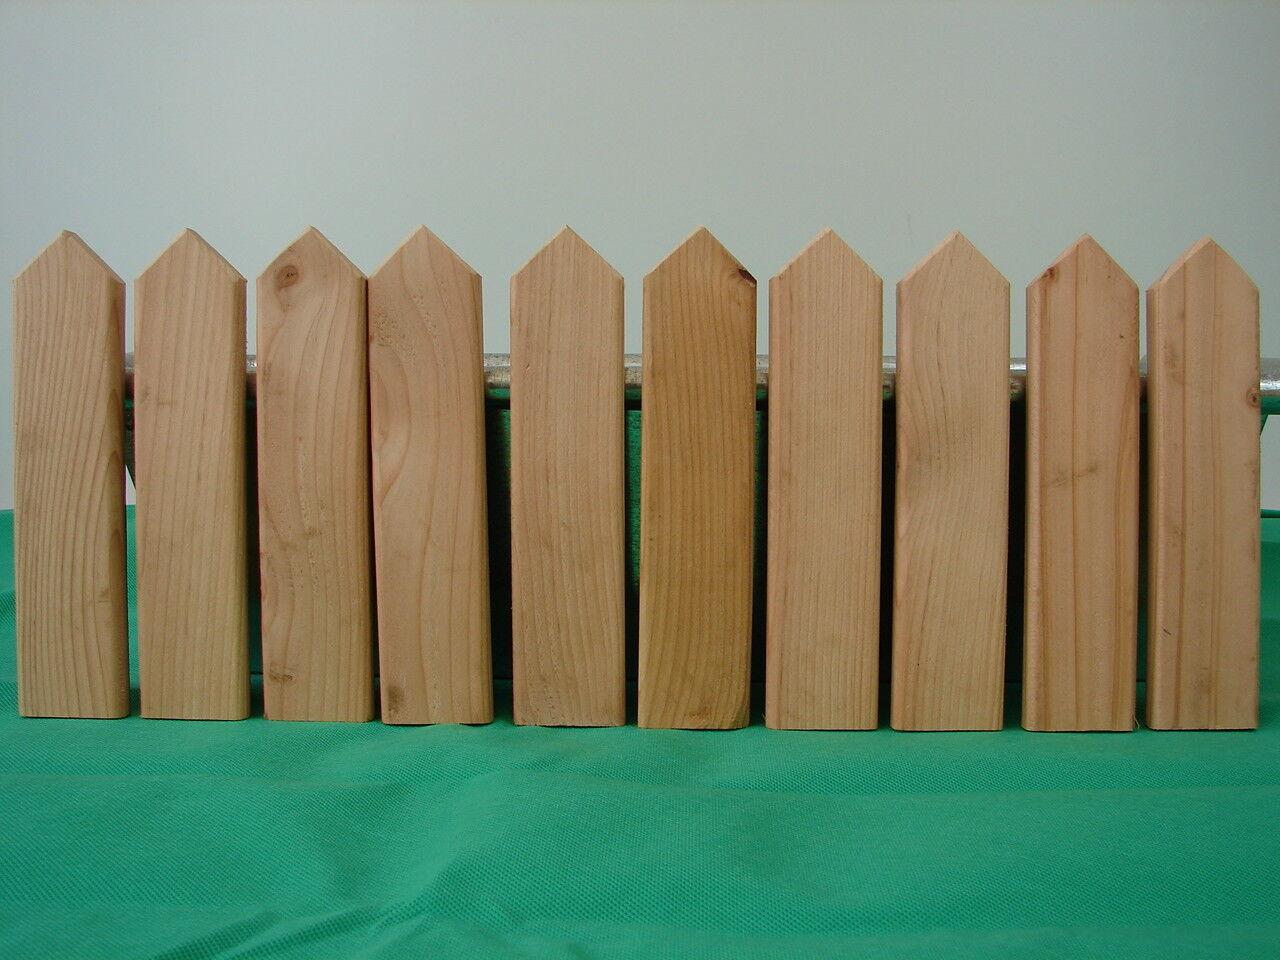 Douglasie Lärche schöne Bretter rustikal Zaun